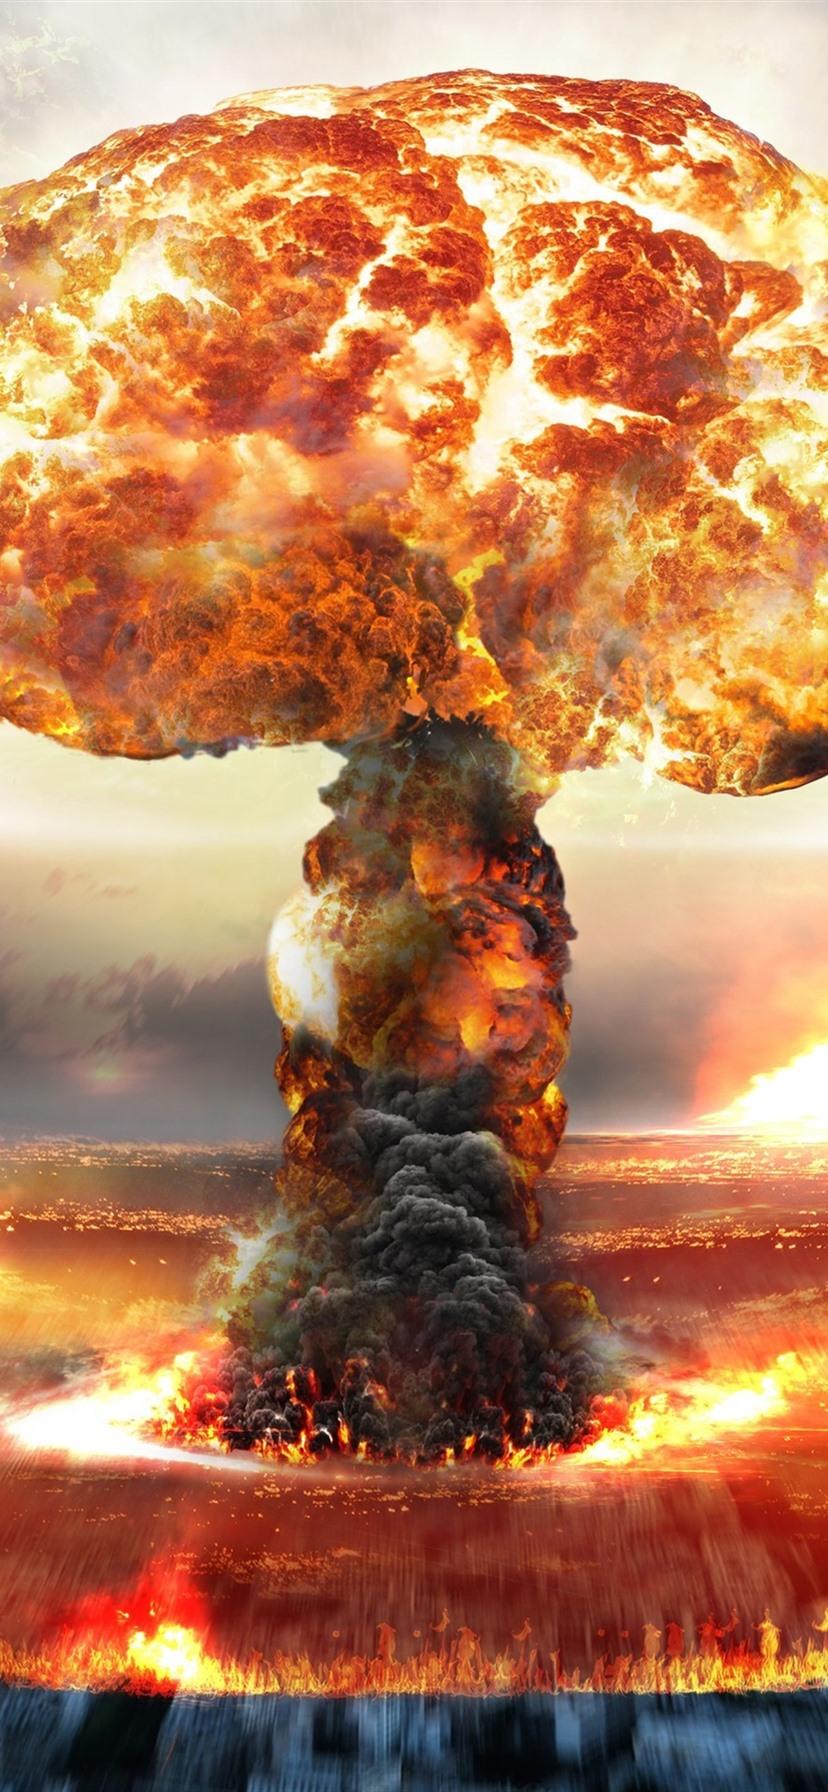 bfb1753ed25 Nuclear bomb explosion, mushroom cloud 1080x1920 iPhone 8/7/6/6S ...